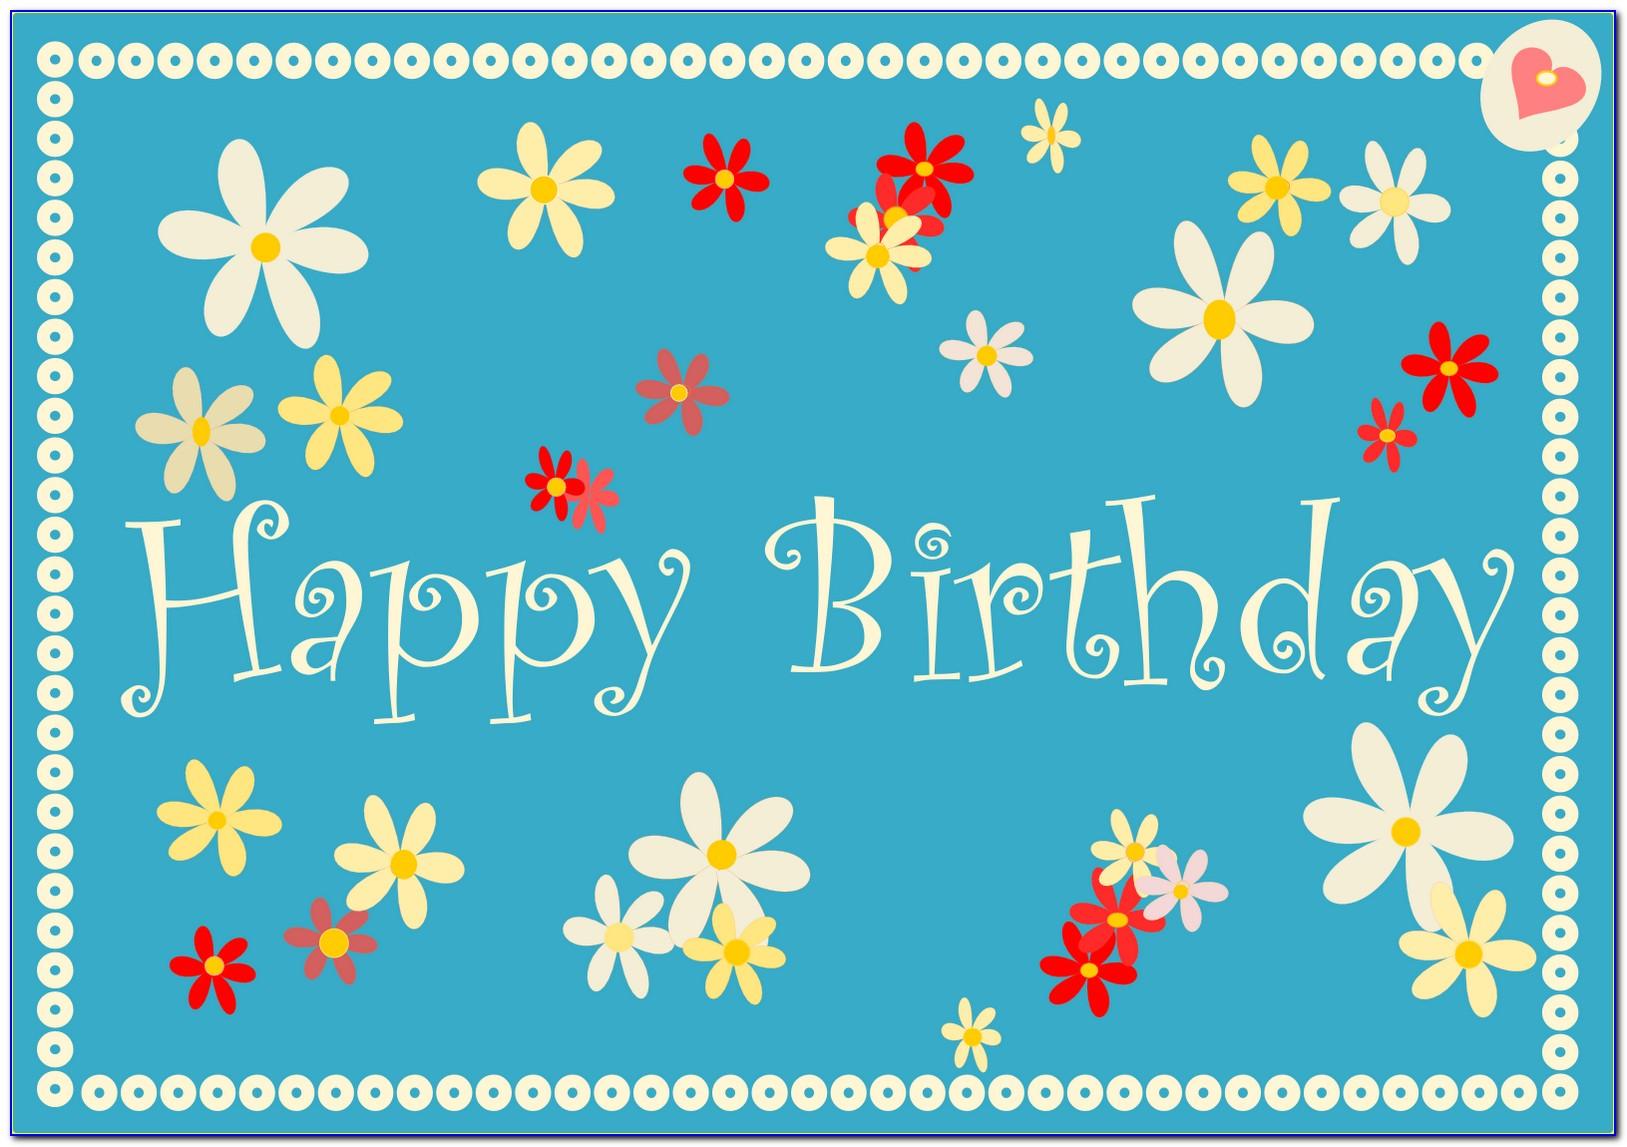 Happy Birthday Cards Online Free Printable